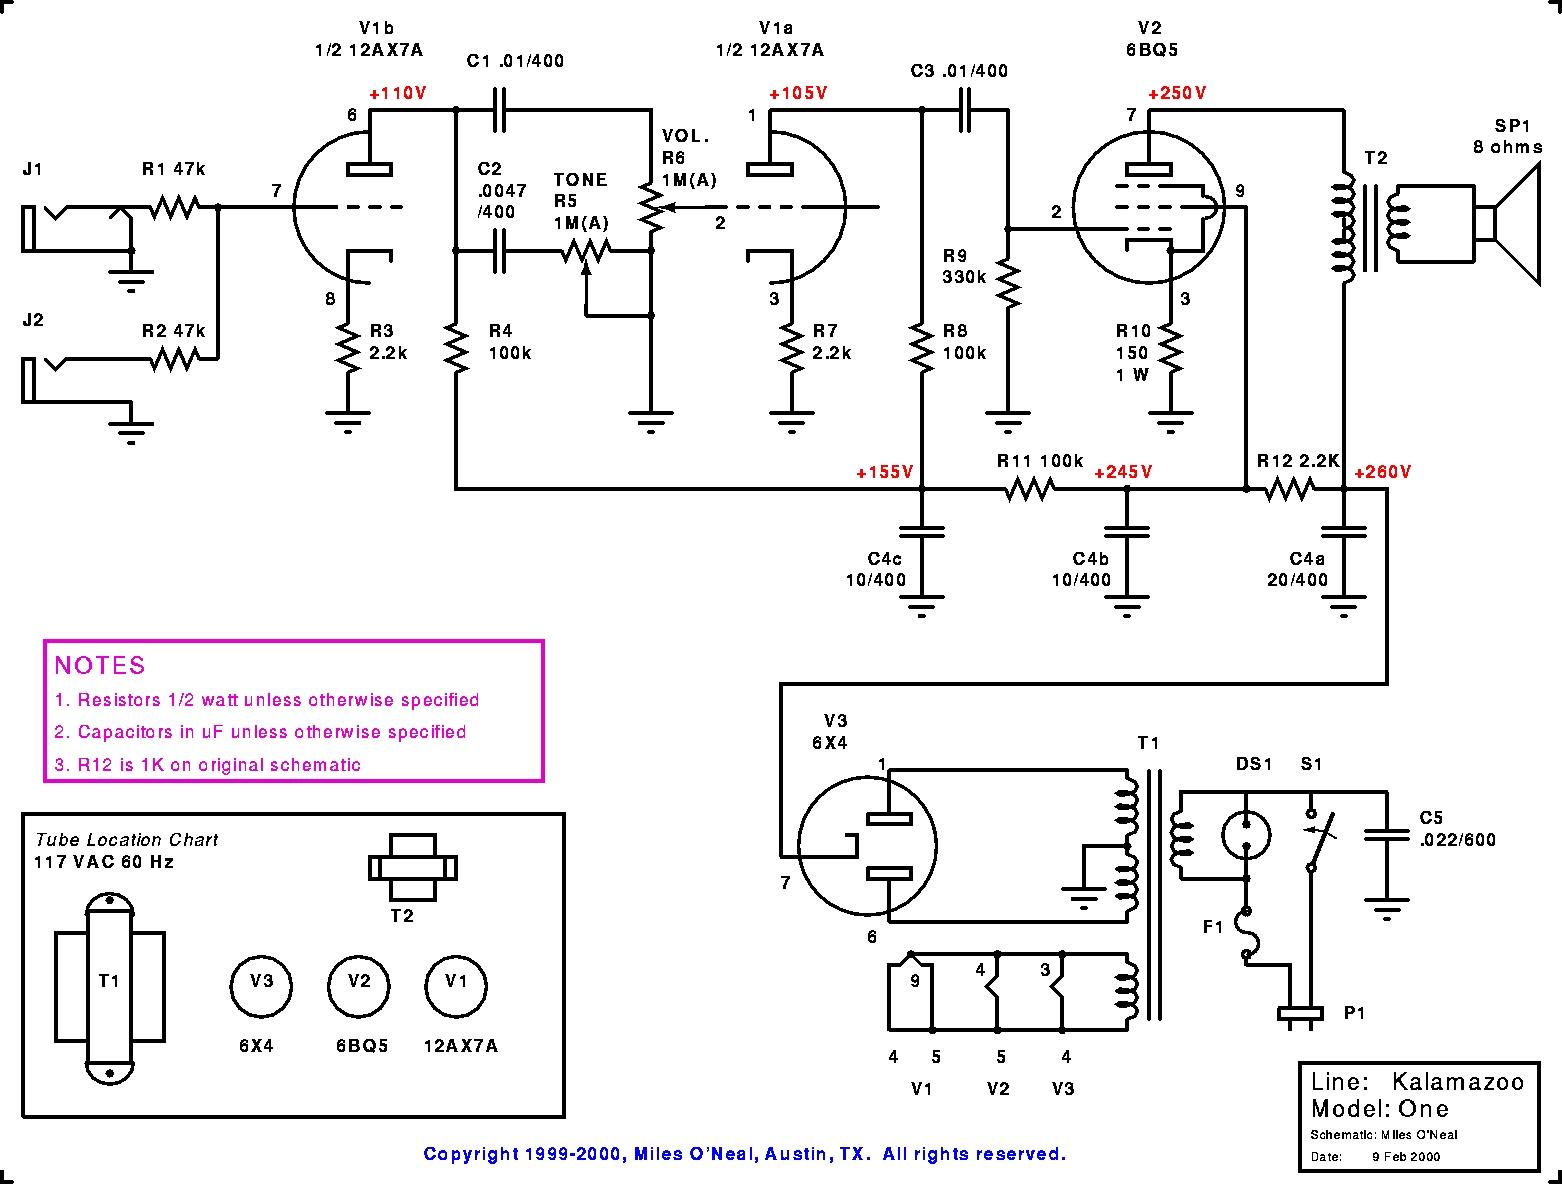 Kalamazoo Amp Field Guide Model 1 Schematic